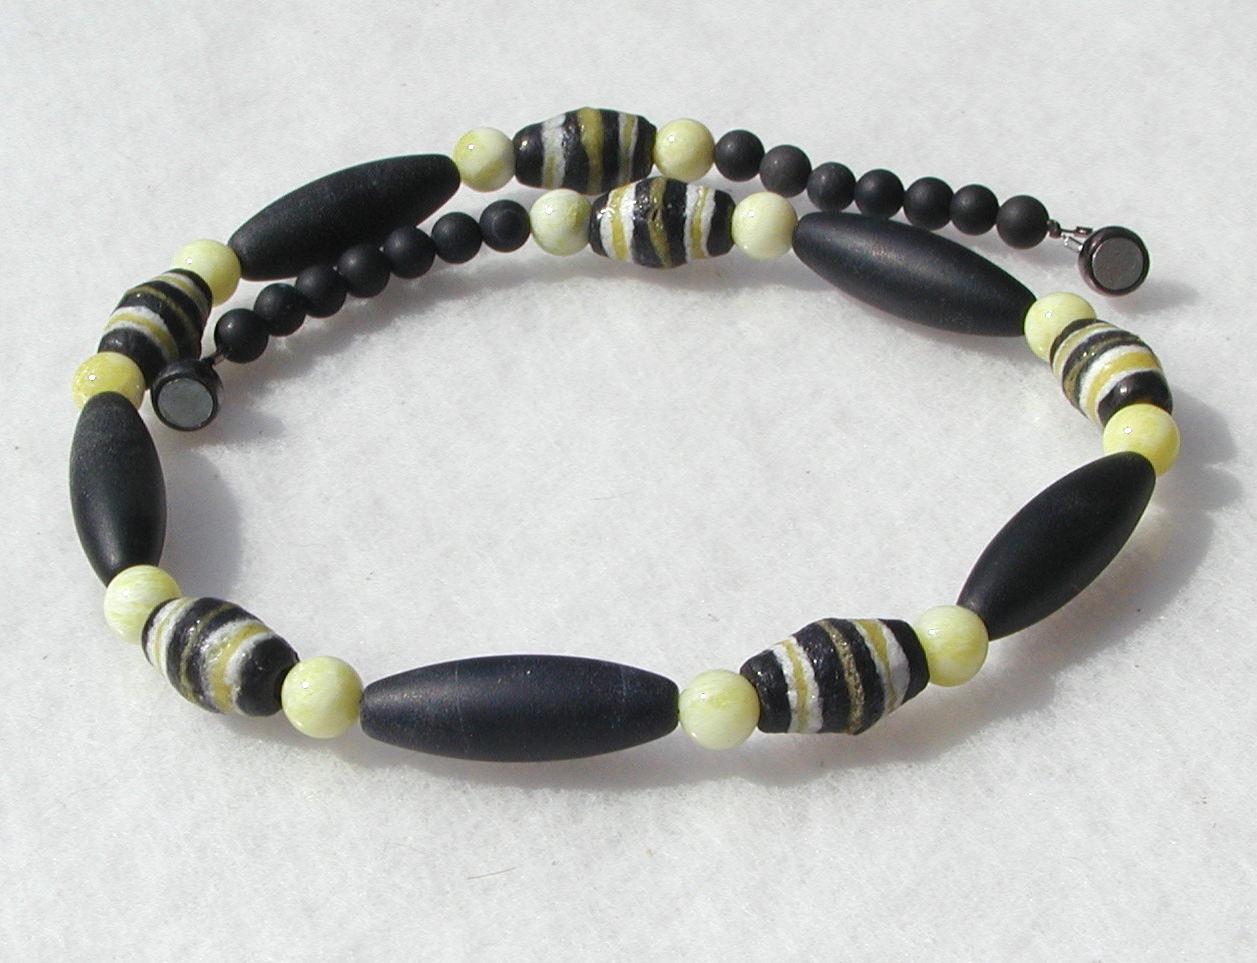 - extravagante Halskette Afrika SCHWARZ-GELB Onyx Lemon-Jade afrikanische Krobo-Perlen Unikat - extravagante Halskette Afrika SCHWARZ-GELB Onyx Lemon-Jade afrikanische Krobo-Perlen Unikat